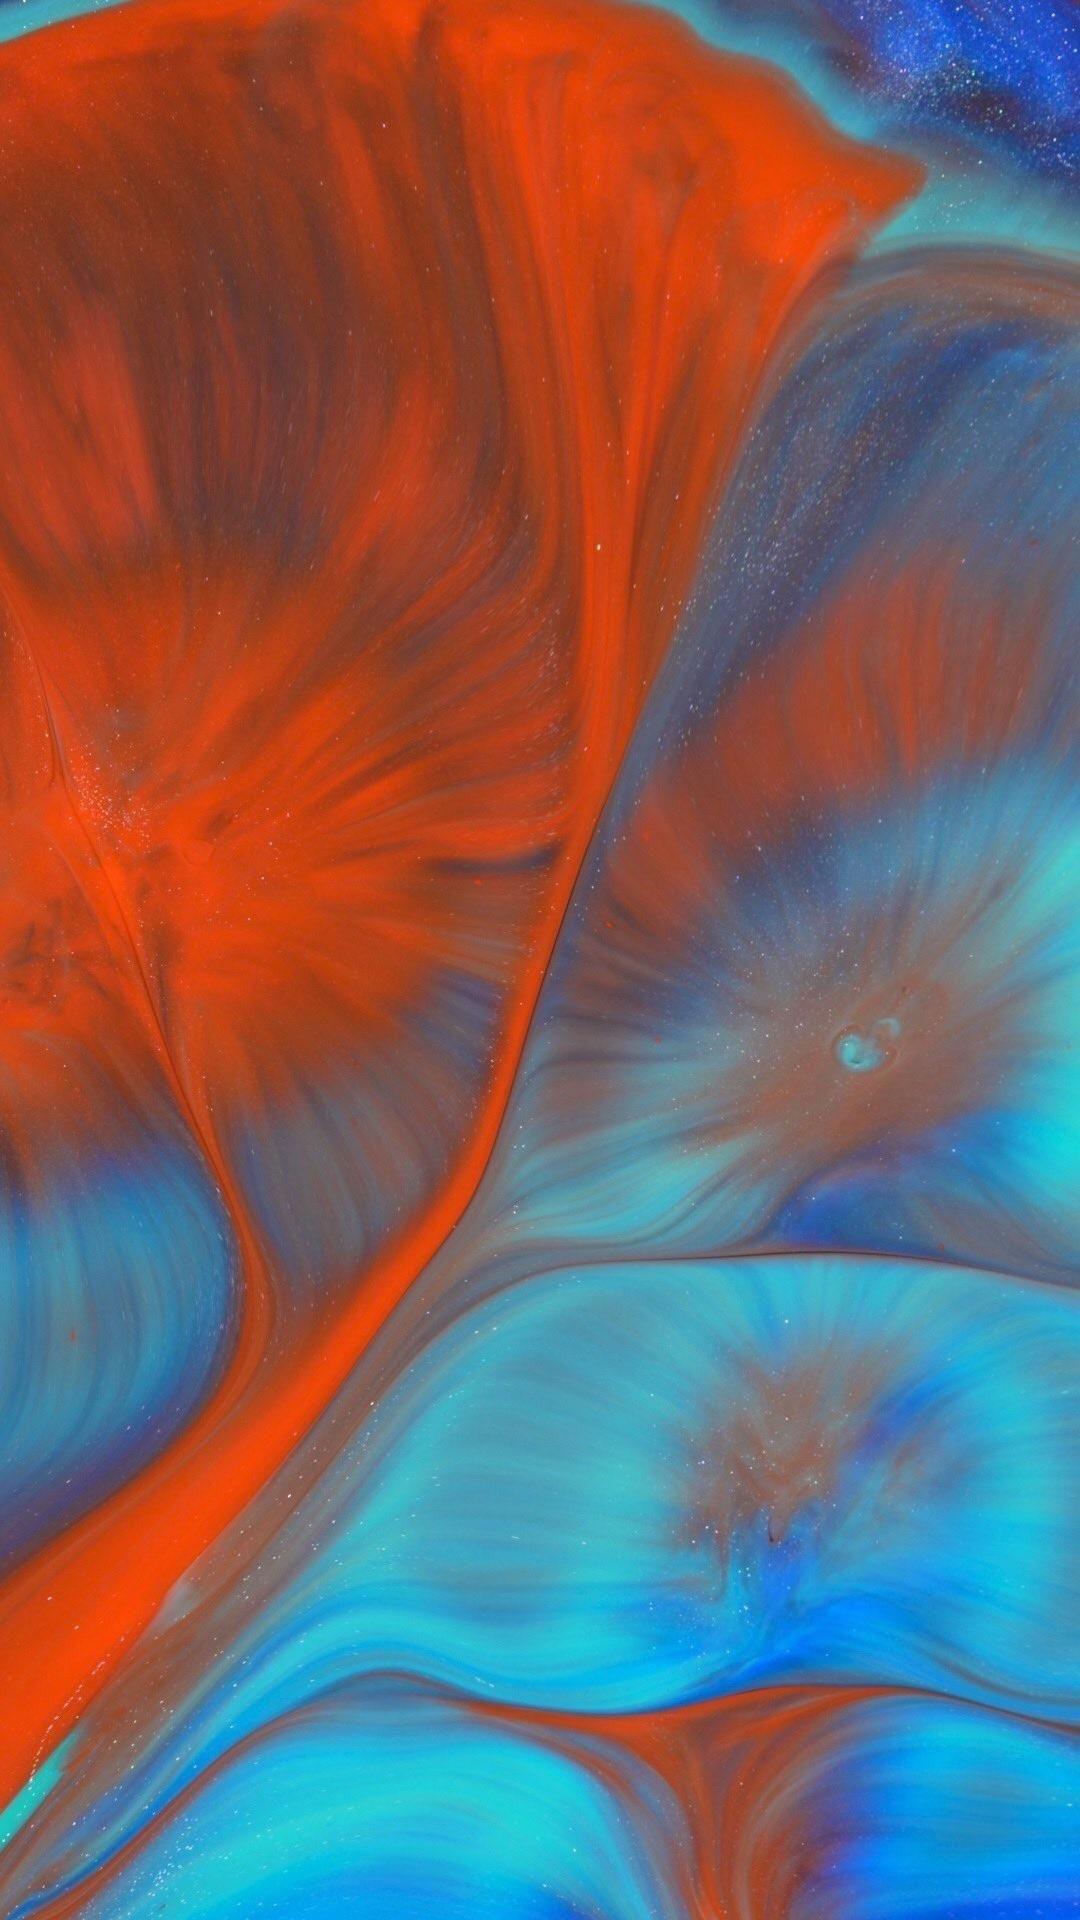 Liquid Wallpaper Orange Wallpaper Colorful Wallpaper